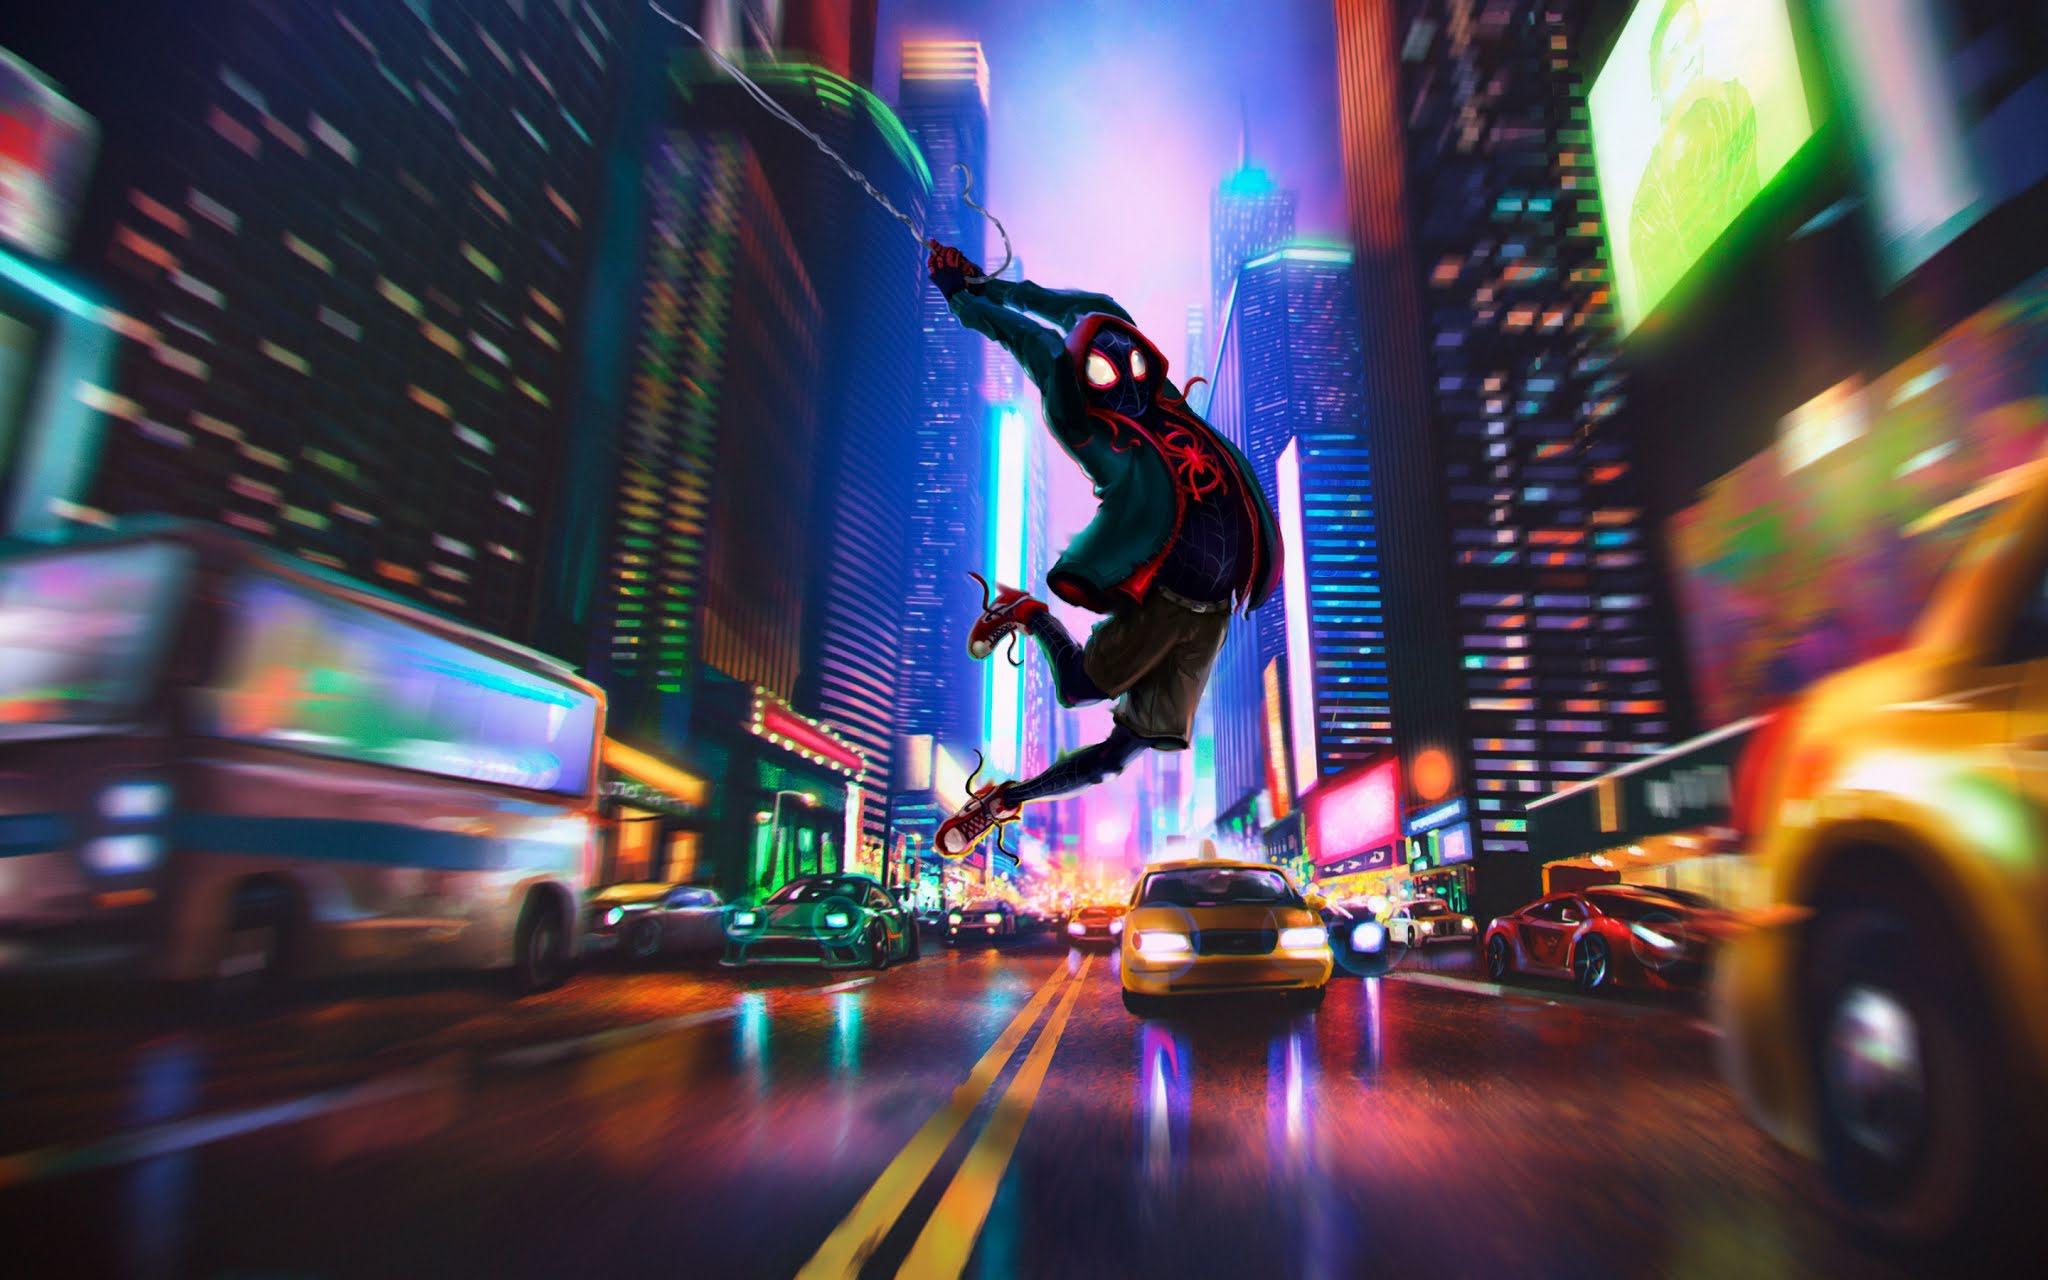 Spider Verse Miles Morales Wallpaper - Spider Man Into The Spider Verse - HD Wallpaper